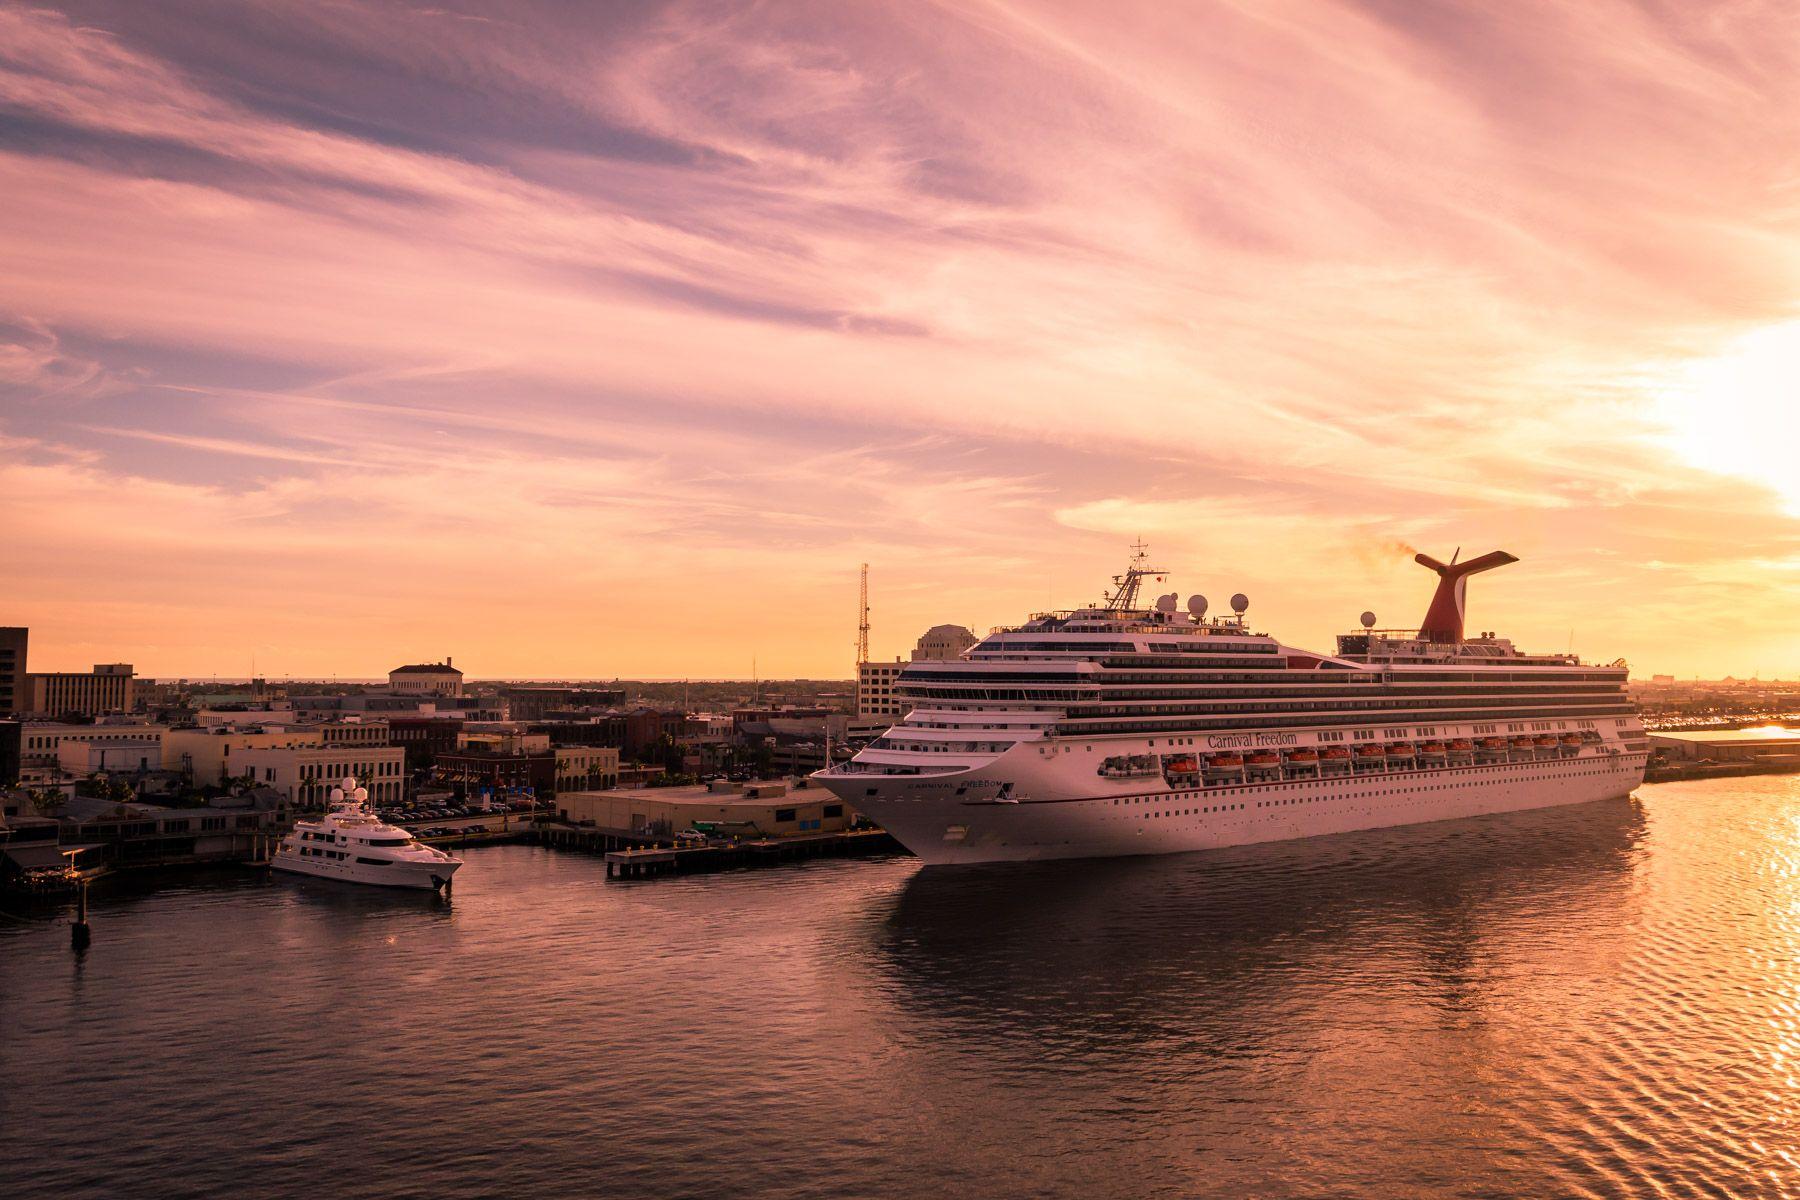 The cruise shipCarnival Freedom docked in Galveston Texas